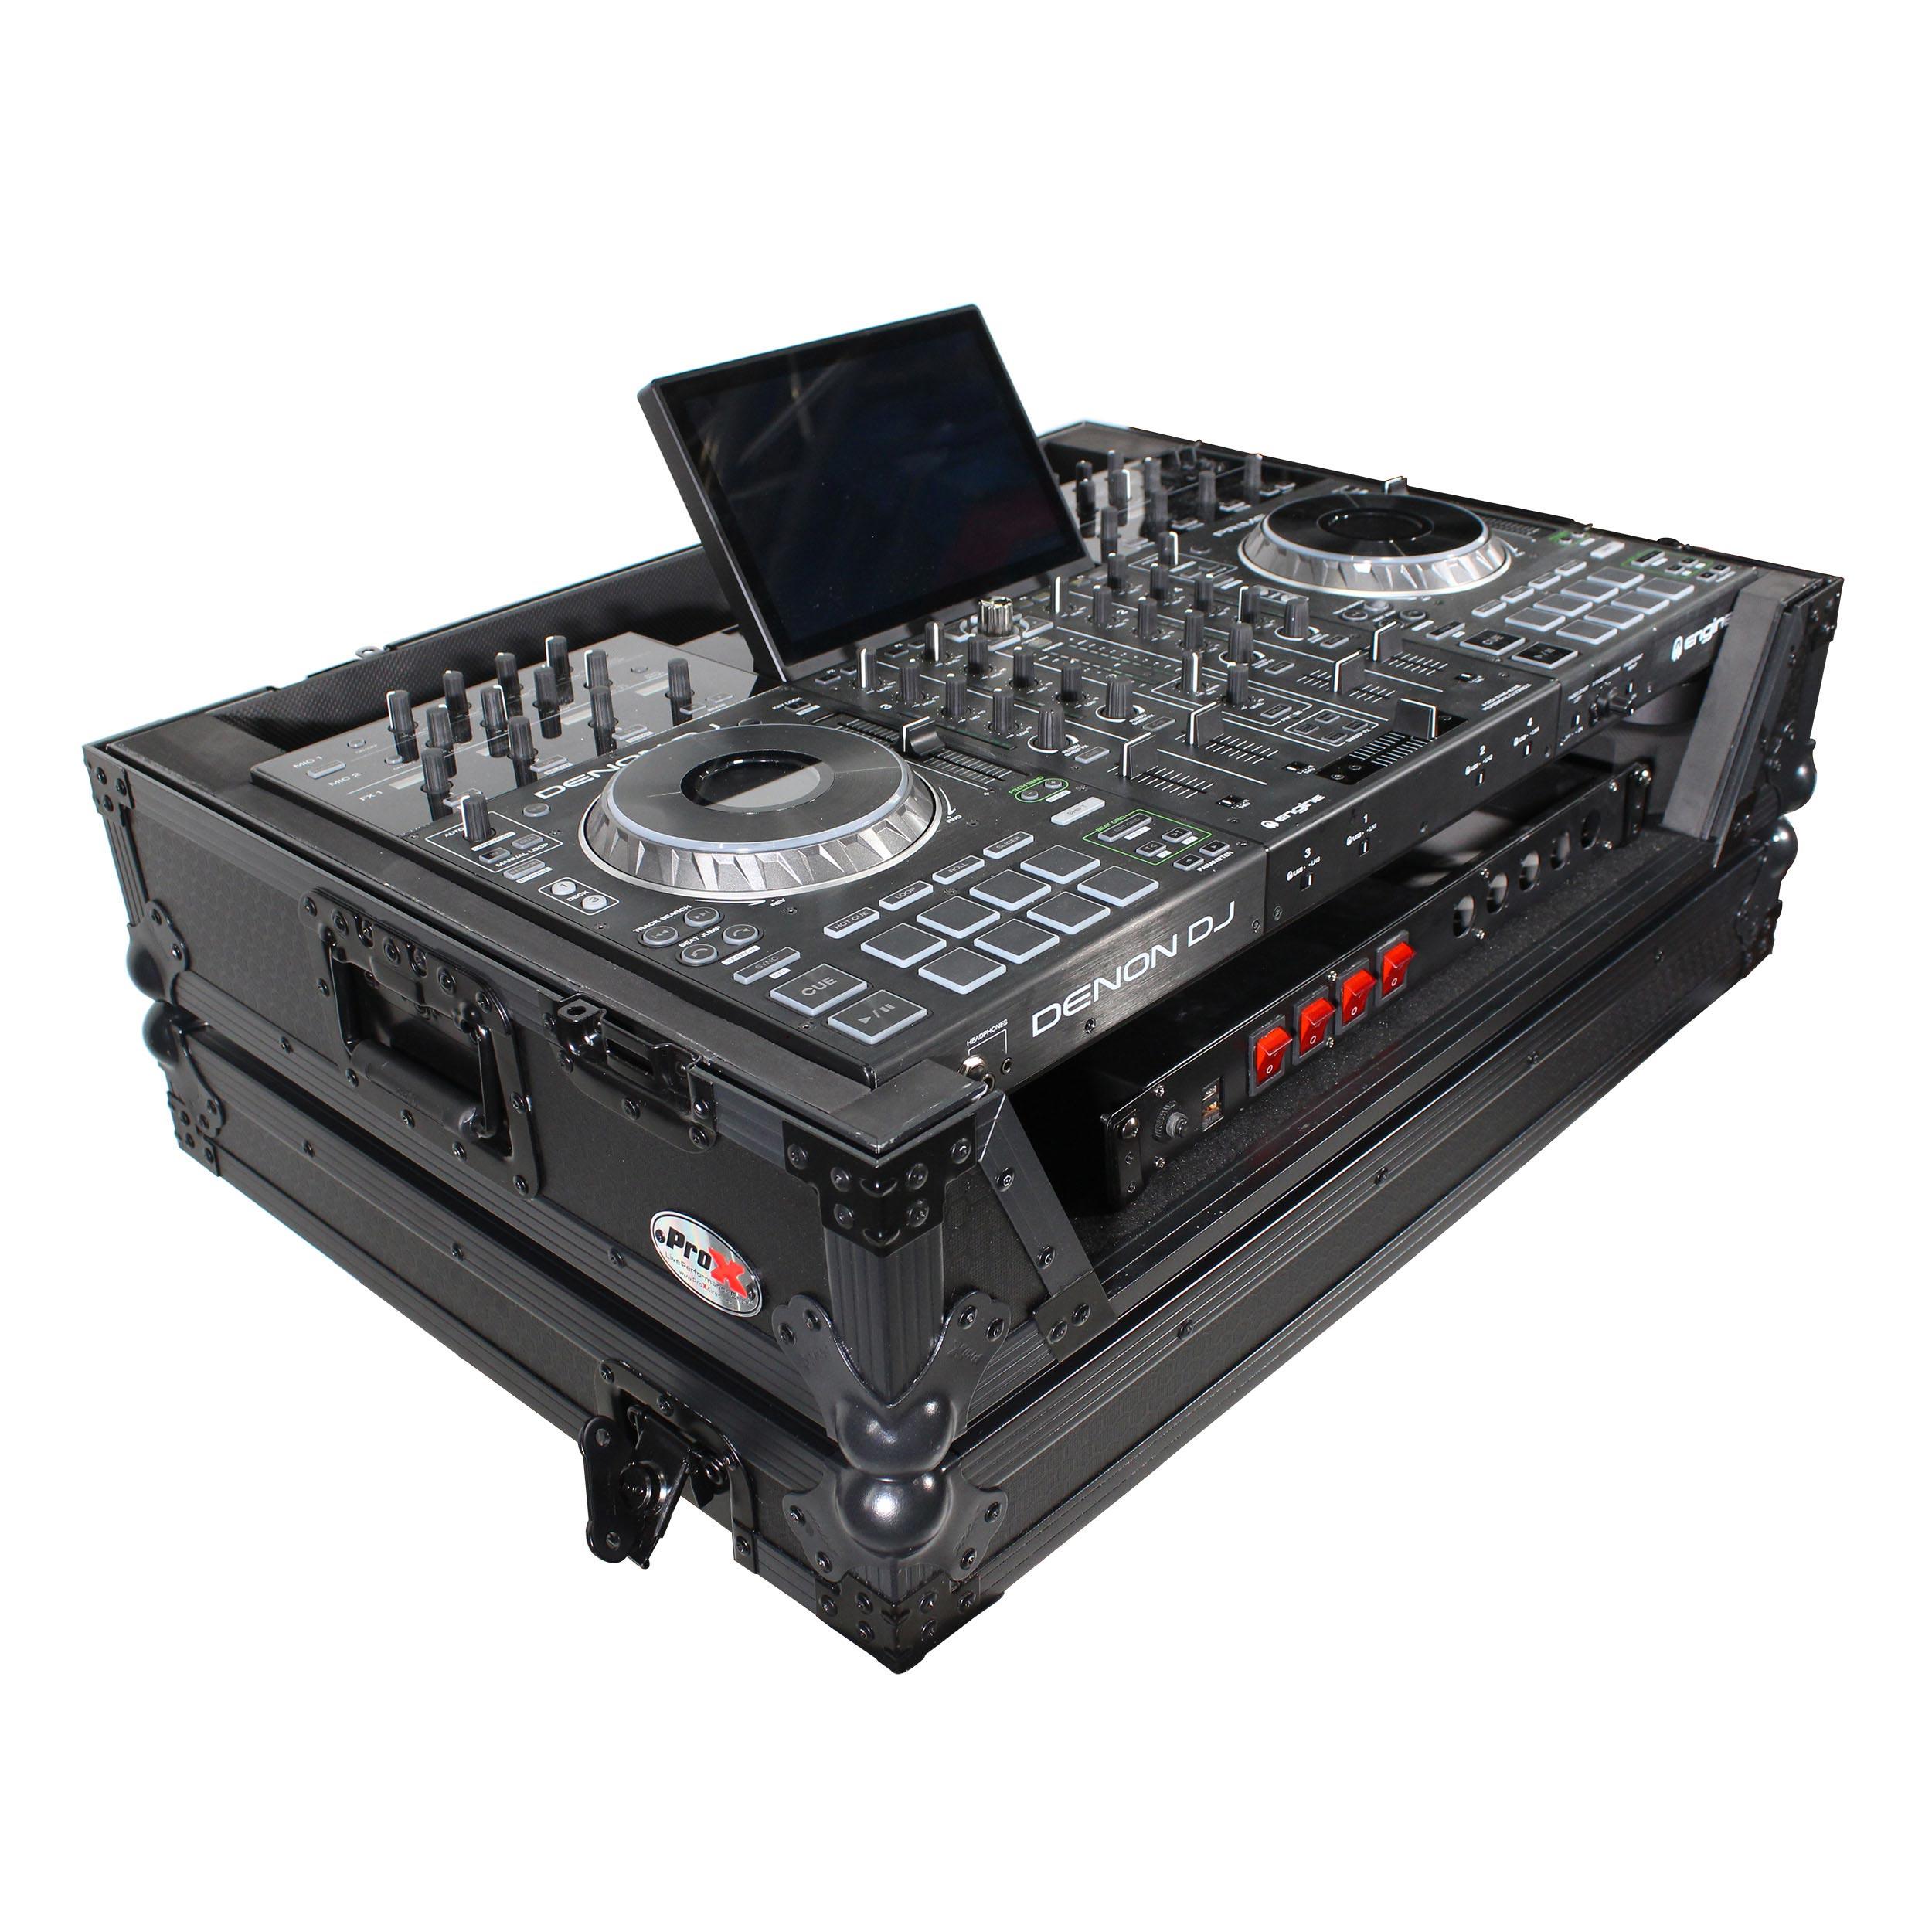 DENON DJ PRIME 4 4-Channel DJ Controller Bundle with FREE BLACK 1U Under  Road Case